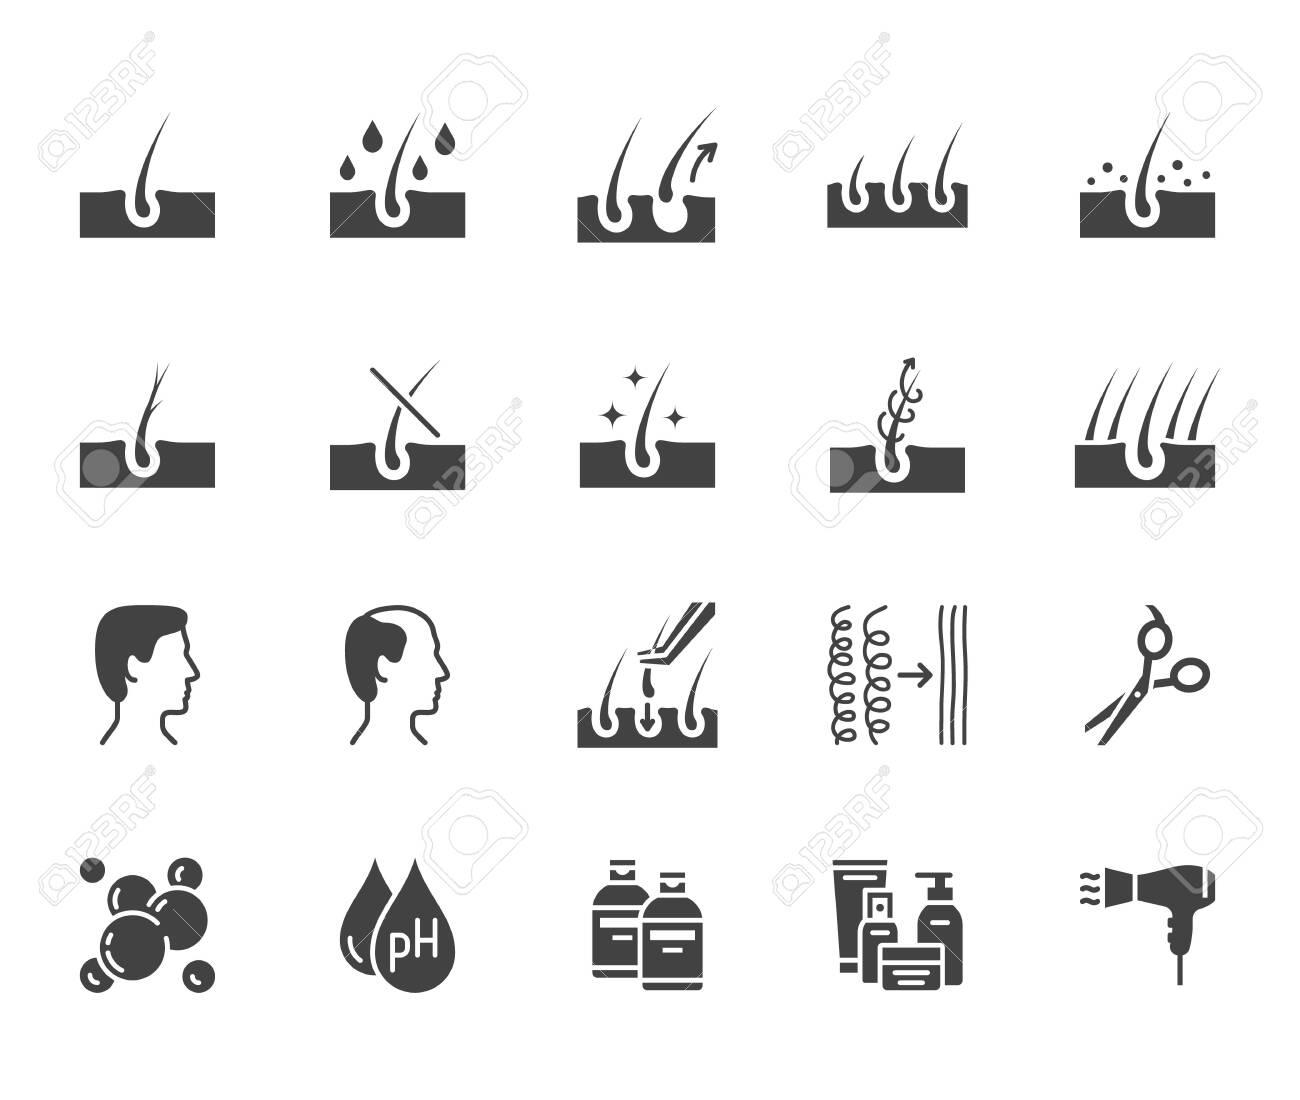 Hair Loss Treatment Flat Glyph Icons Set Shampoo Ph Dandruff Royalty Free Cliparts Vectors And Stock Illustration Image 137237887